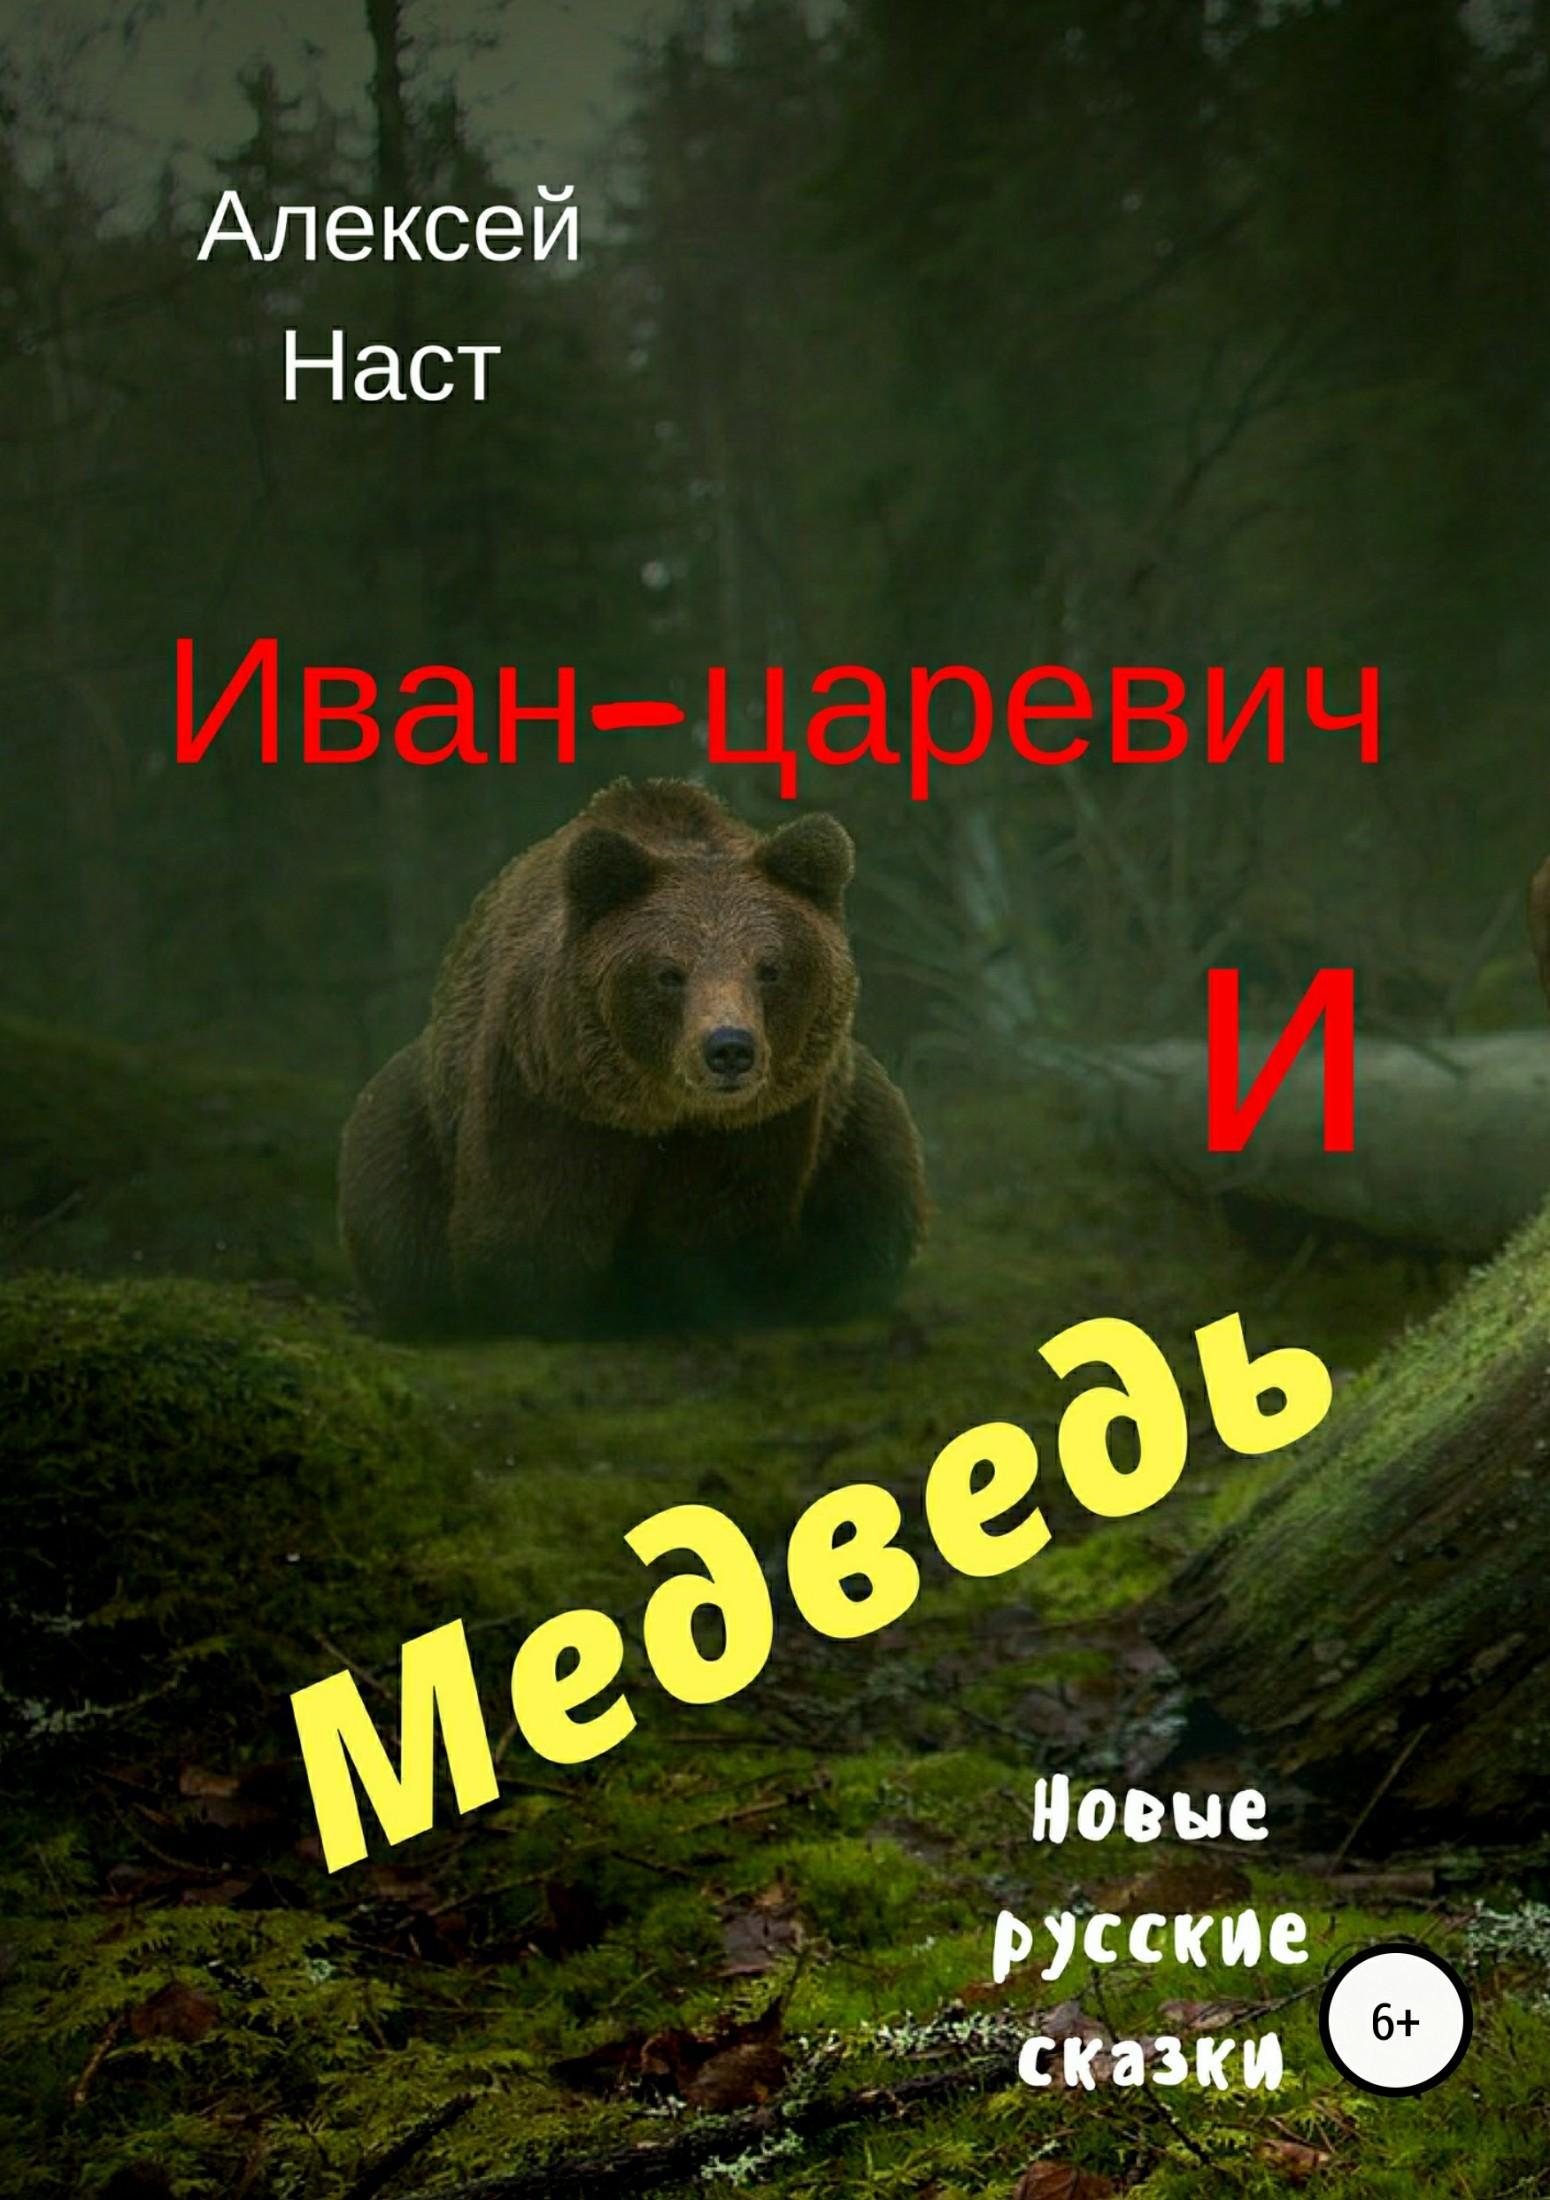 Алексей Николаевич Наст Иван-царевич и Медведь